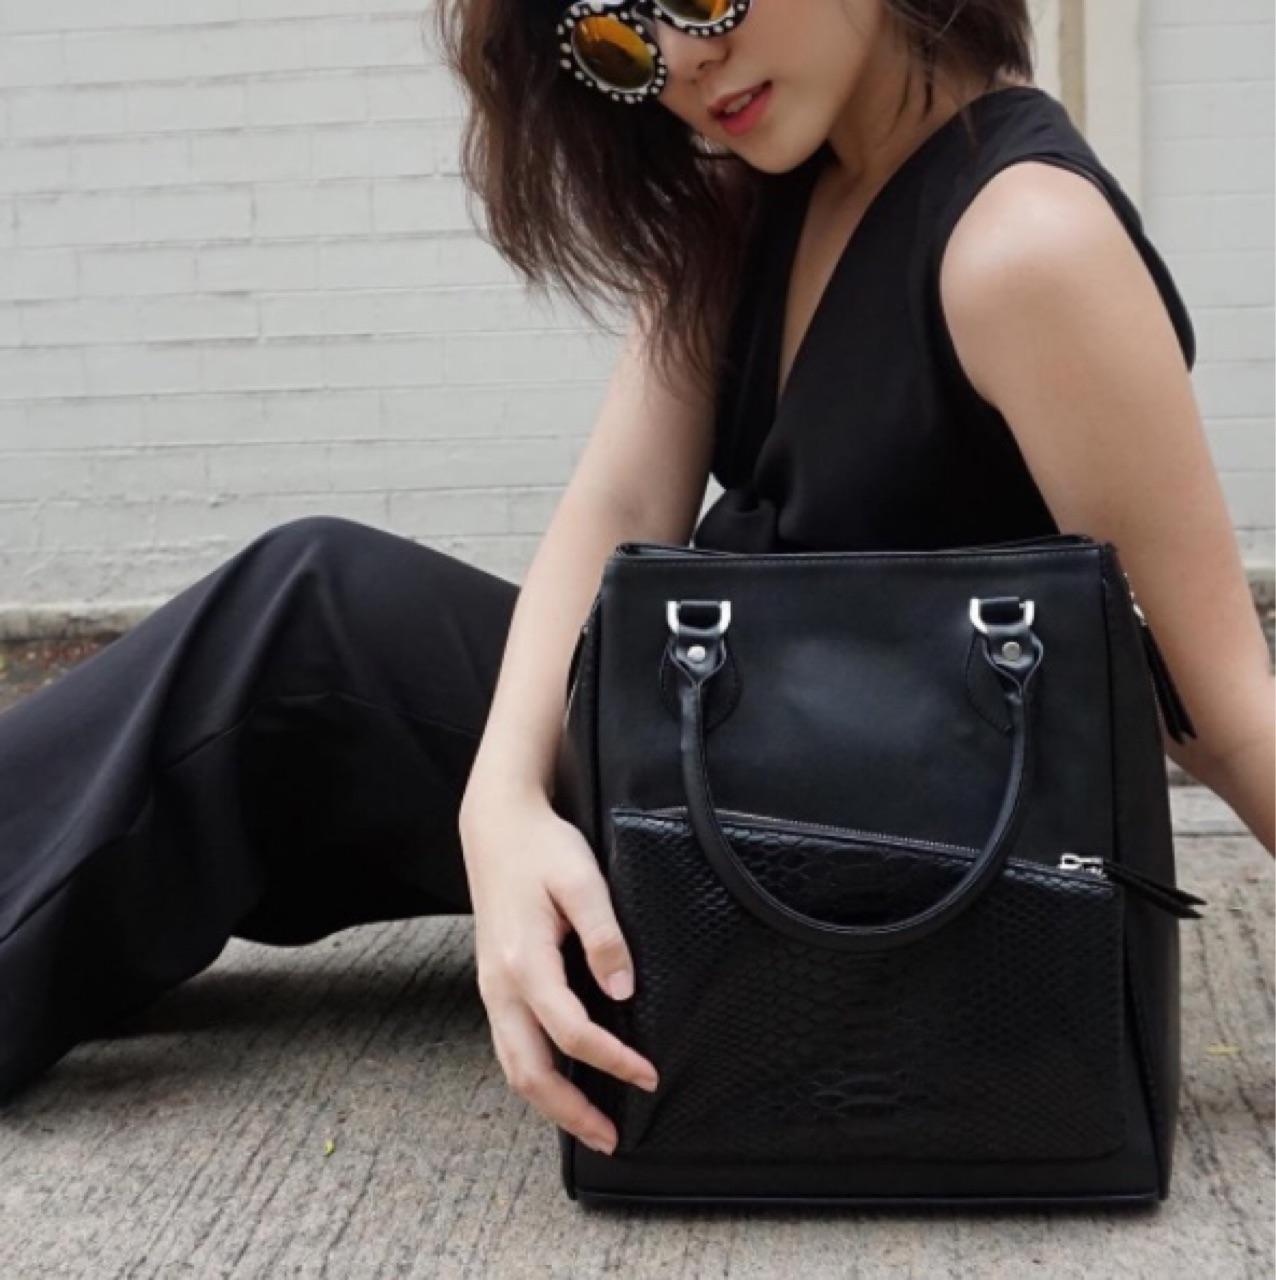 ucanwear,torytote,bagdesign,bagshop,unique,minimal,simplestyle,UCANWEAR,กระเป๋า,กระเป๋าหนัง,กระเป๋าสะพาย,กระเป๋าถือ,กระเป๋าผู้หญิง